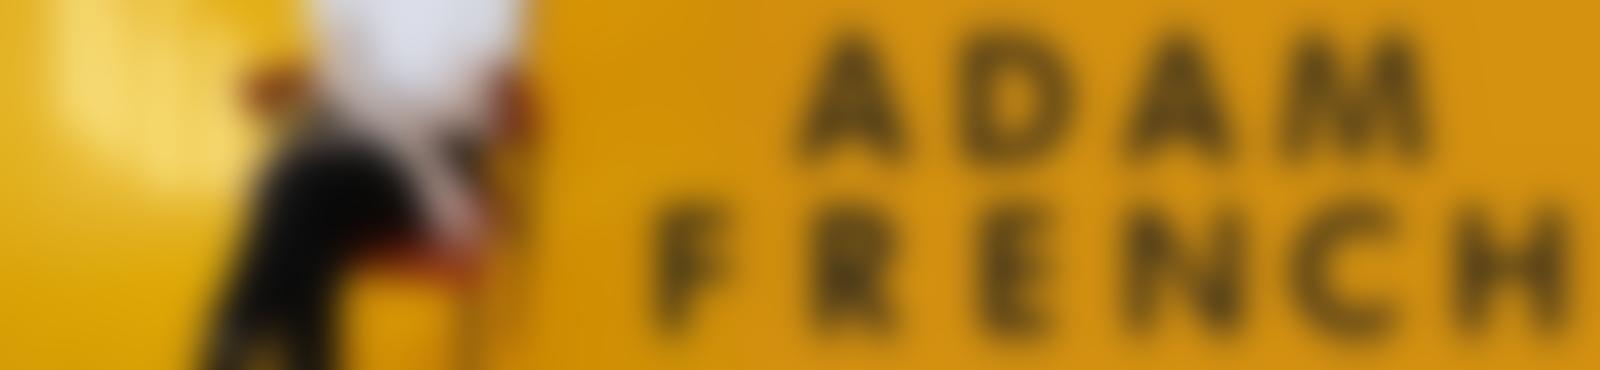 Blurred ef0c5051 0218 463f aaba 52896bf9bd9d